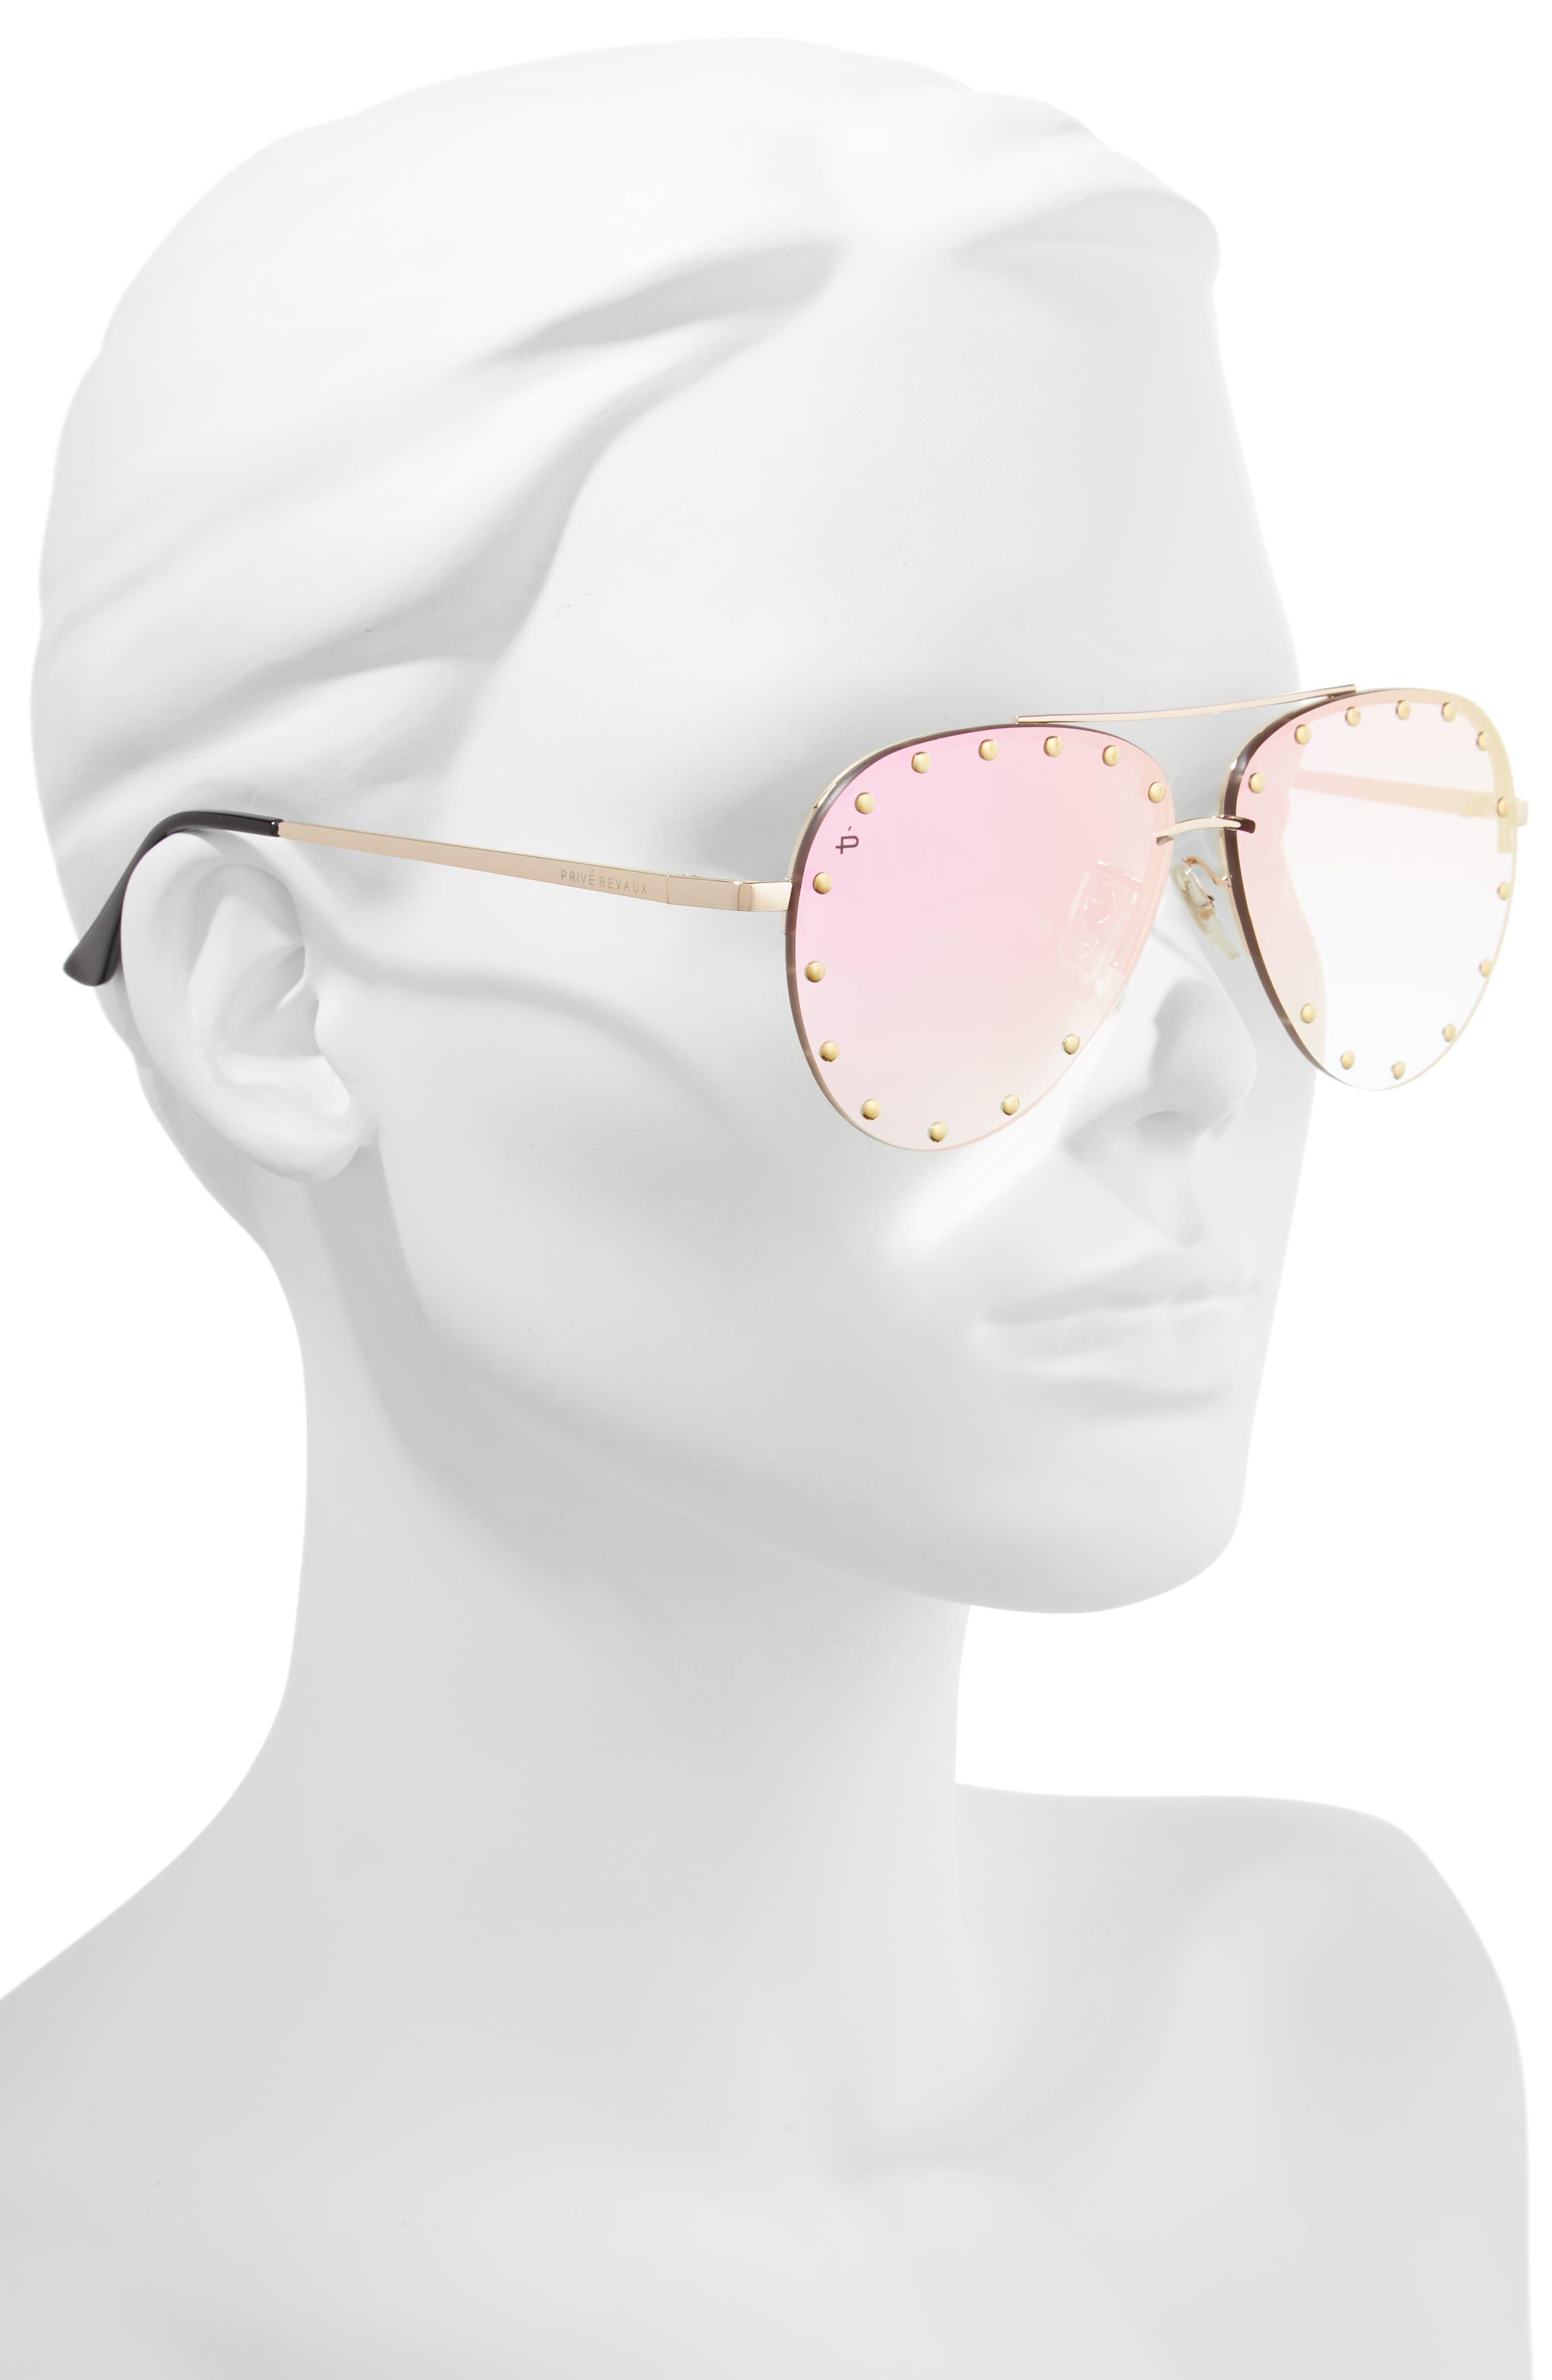 Privé Revaux The Sixth Man 60mm Studded Aviator Sunglasses,                             Alternate thumbnail 6, color,